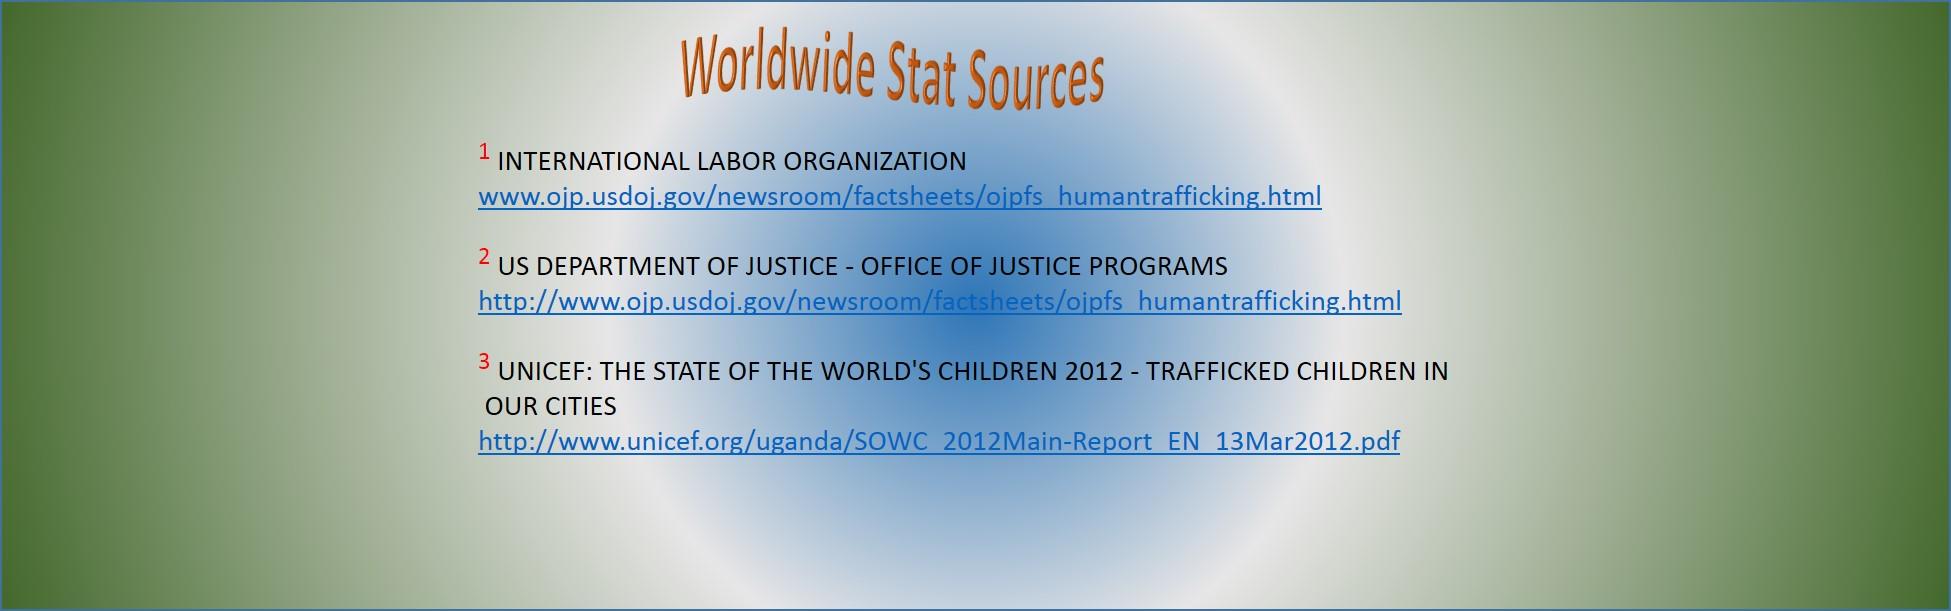 1 Worldwide Stat sources.jpg